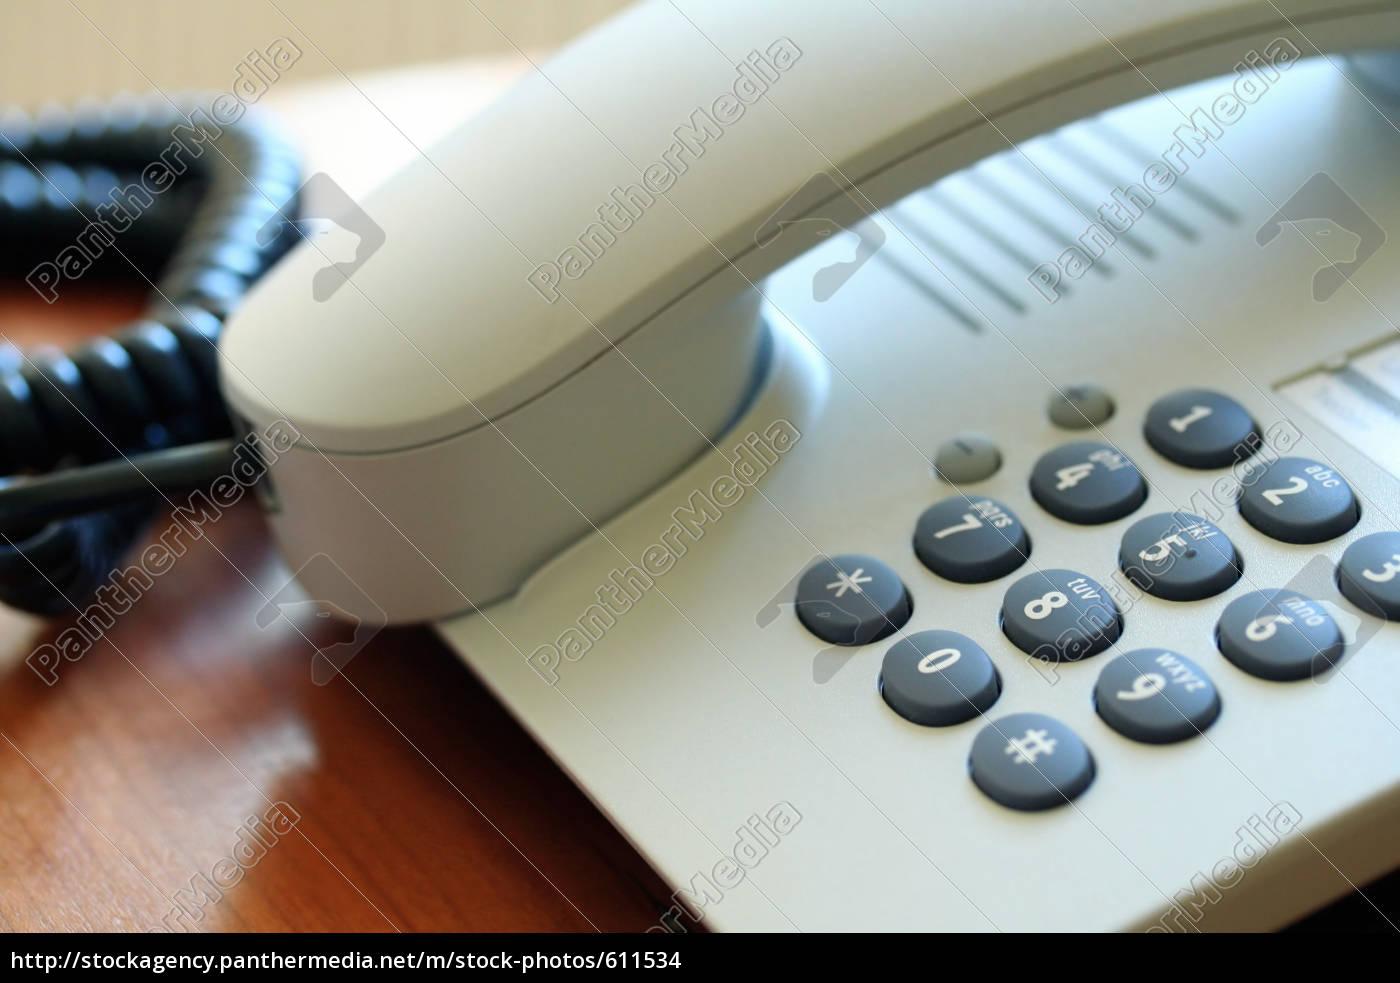 phone - 611534